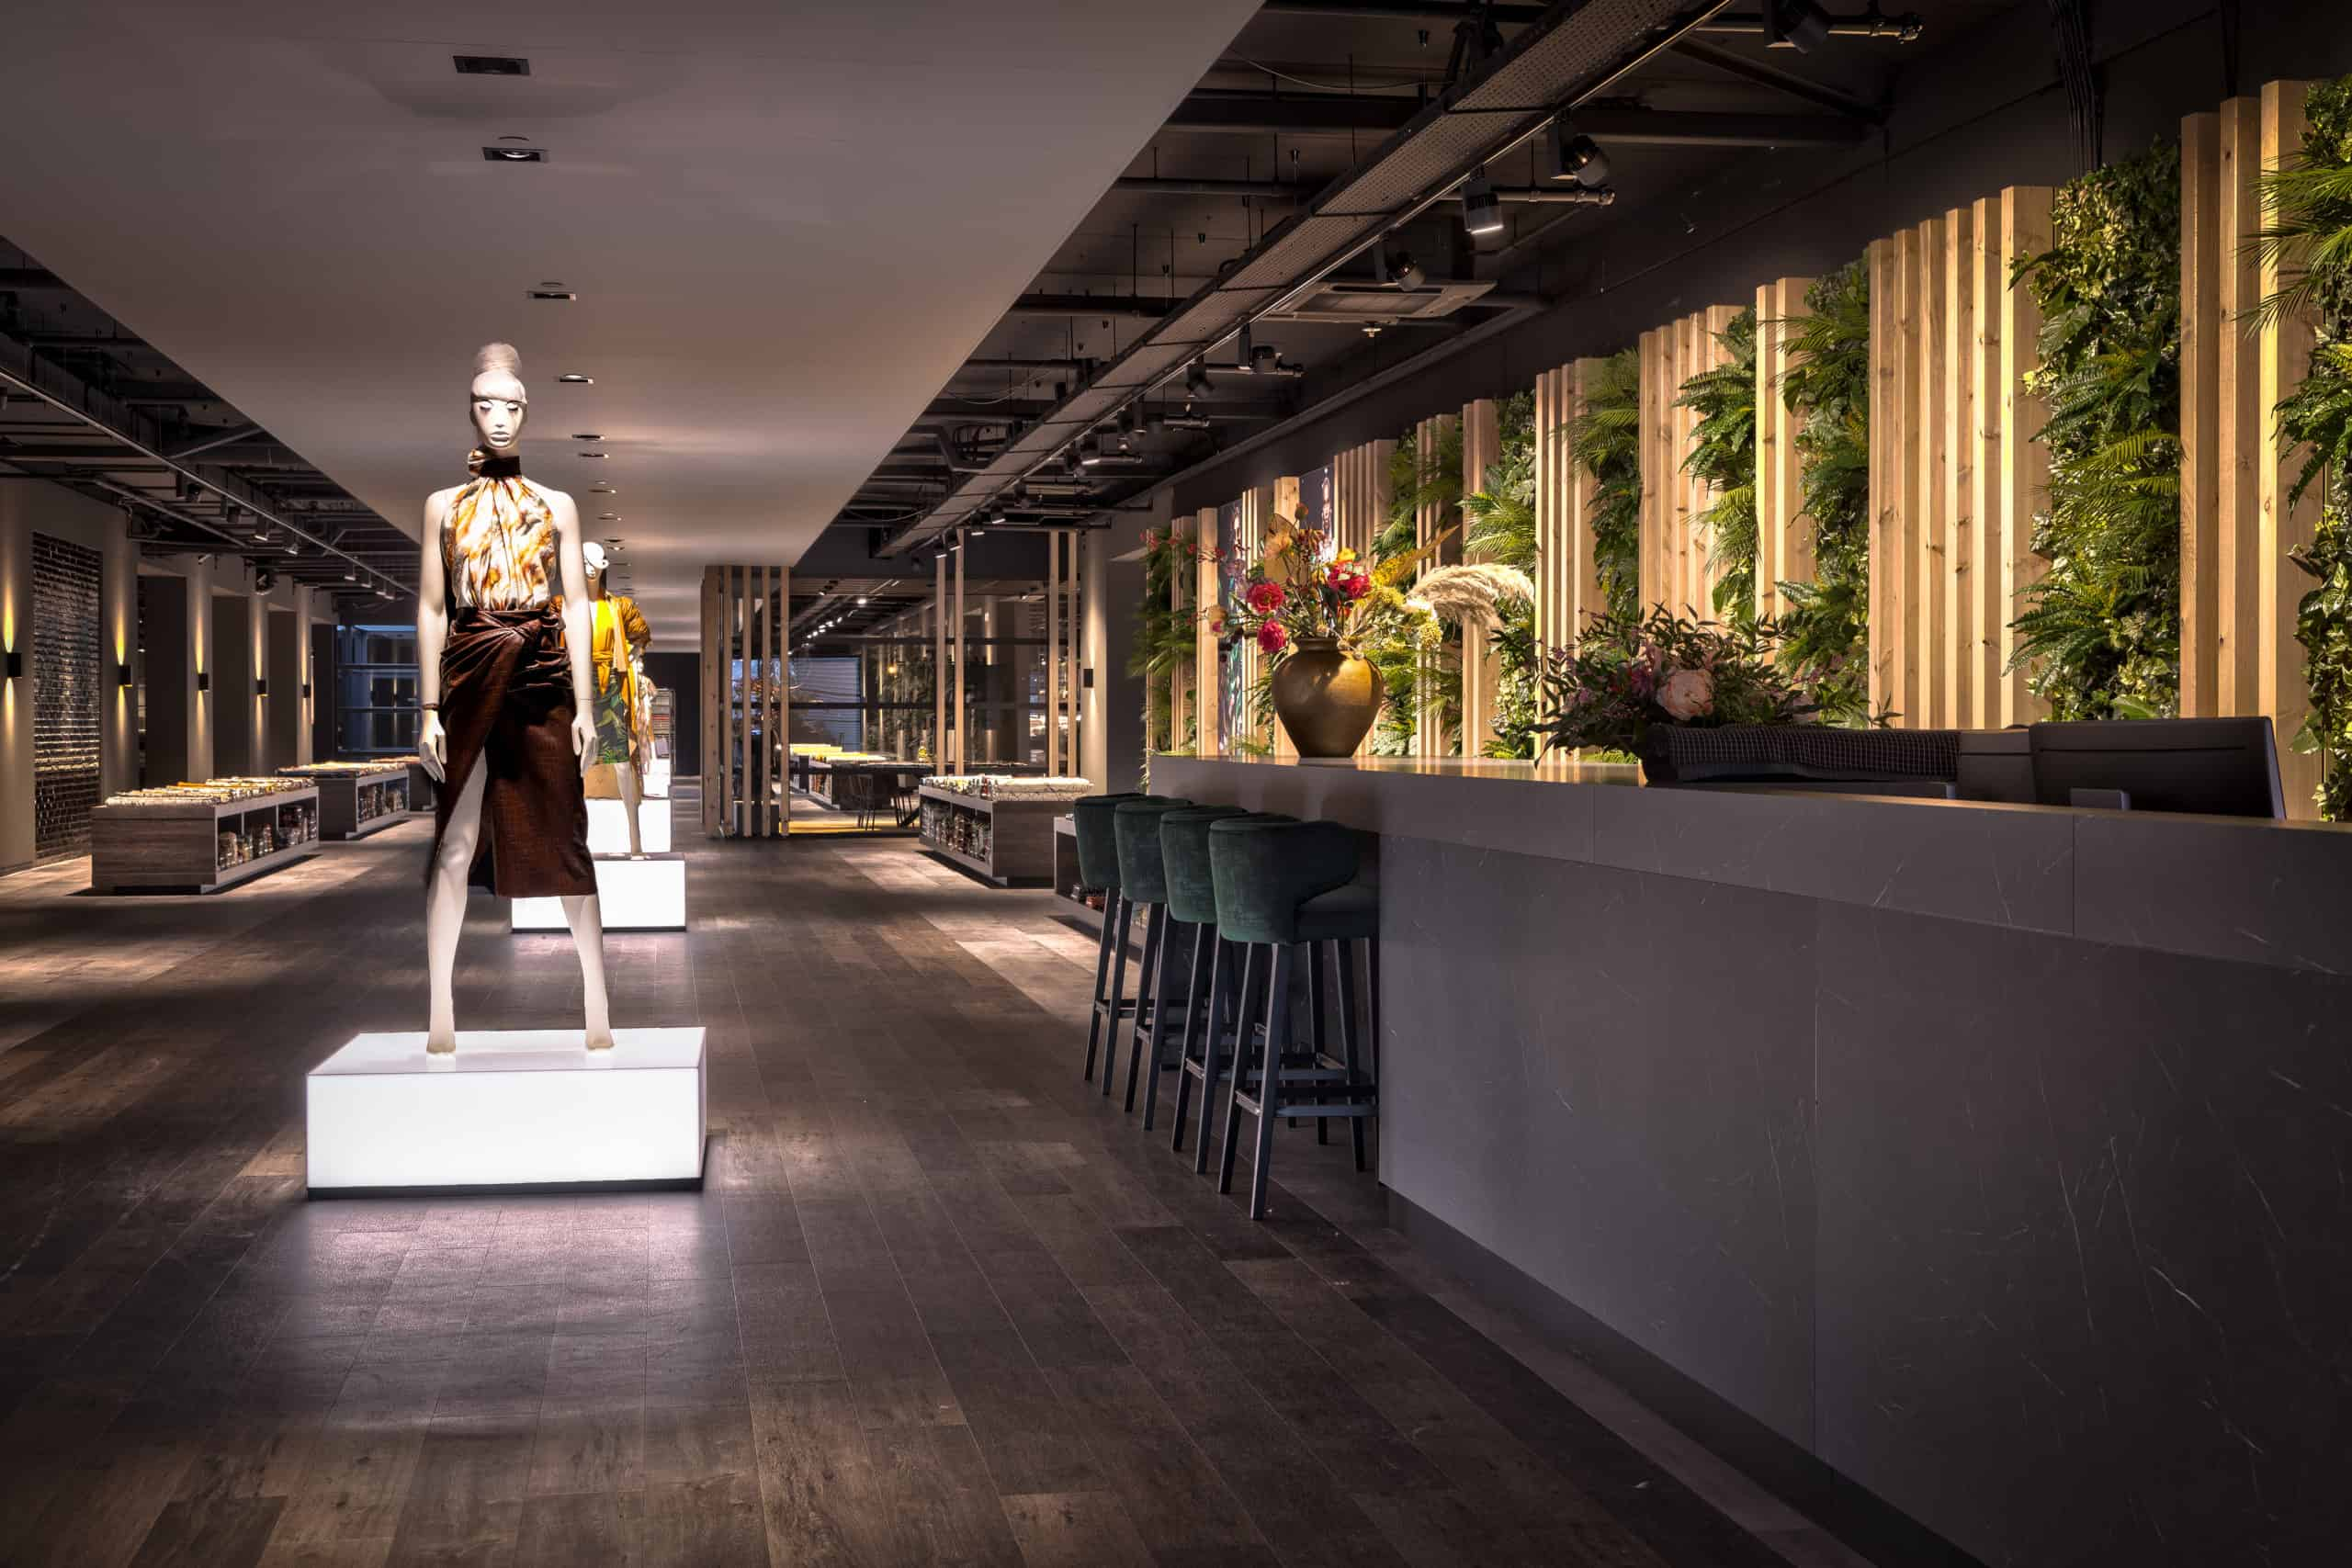 interieurarchitect Wildenberg ontwerp showroom Knipidee Almere receptie balie wsb maretti iboma kerastone objectflor tarkett